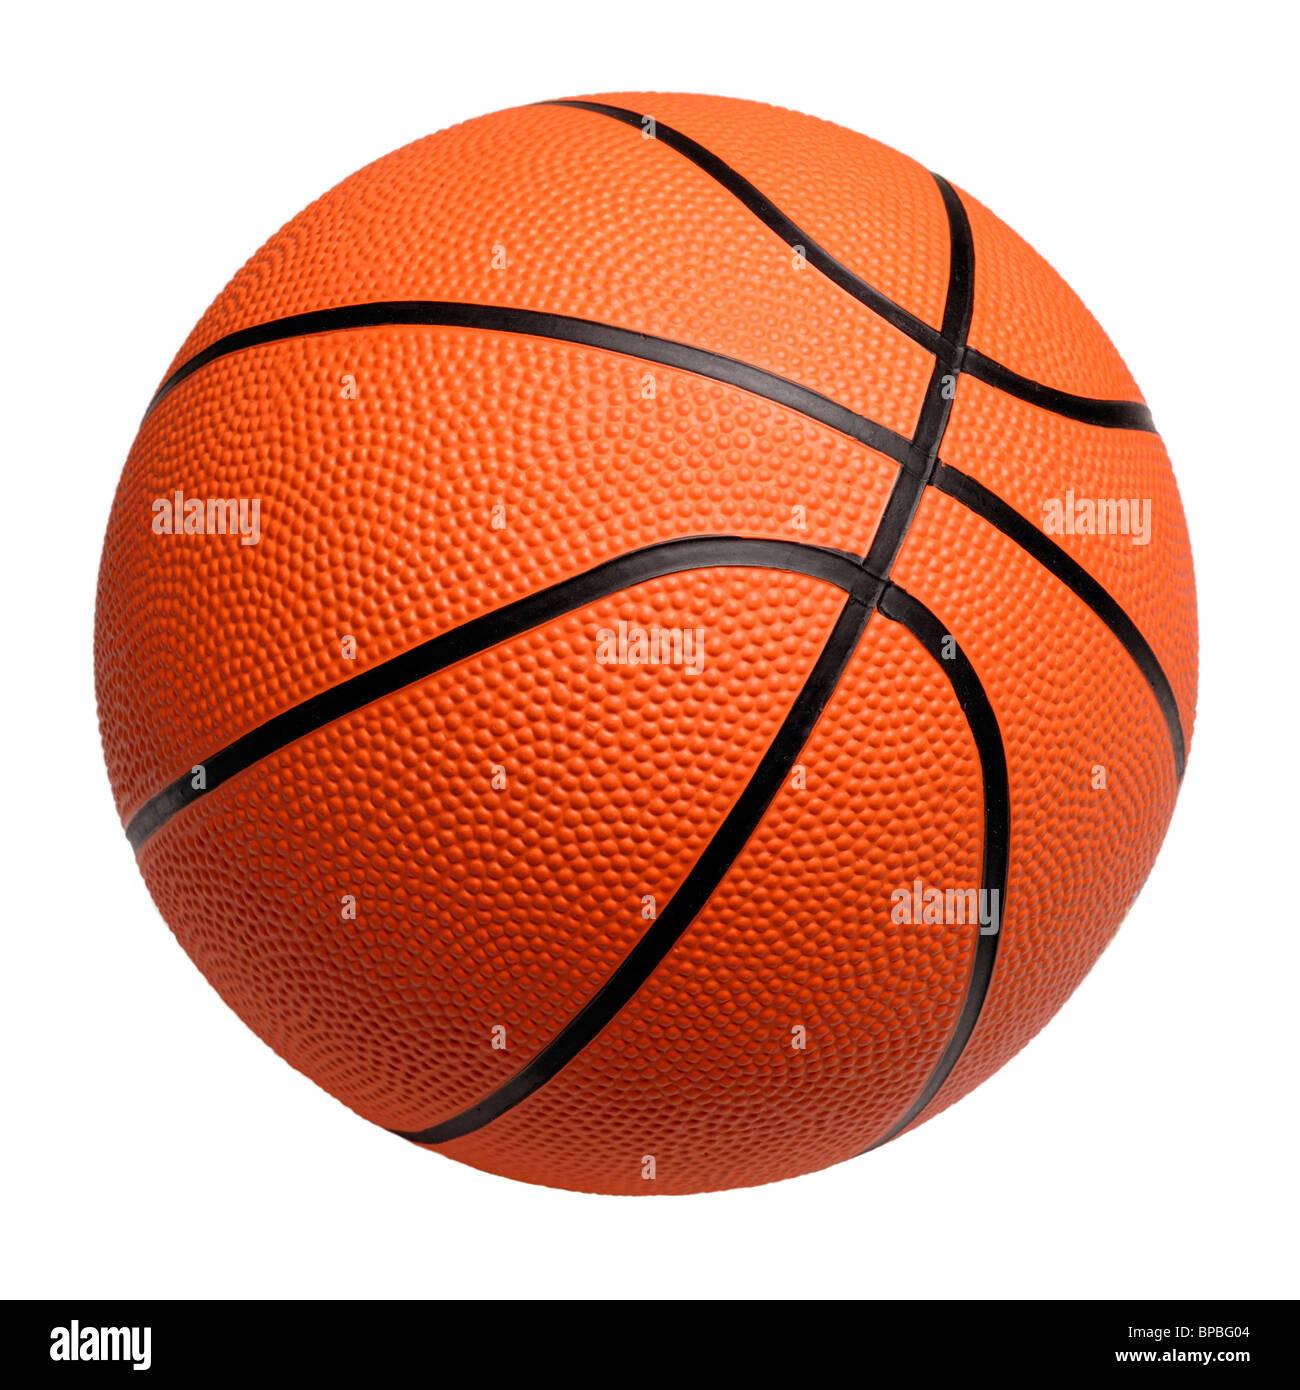 plastic orange basketball - Stock Image